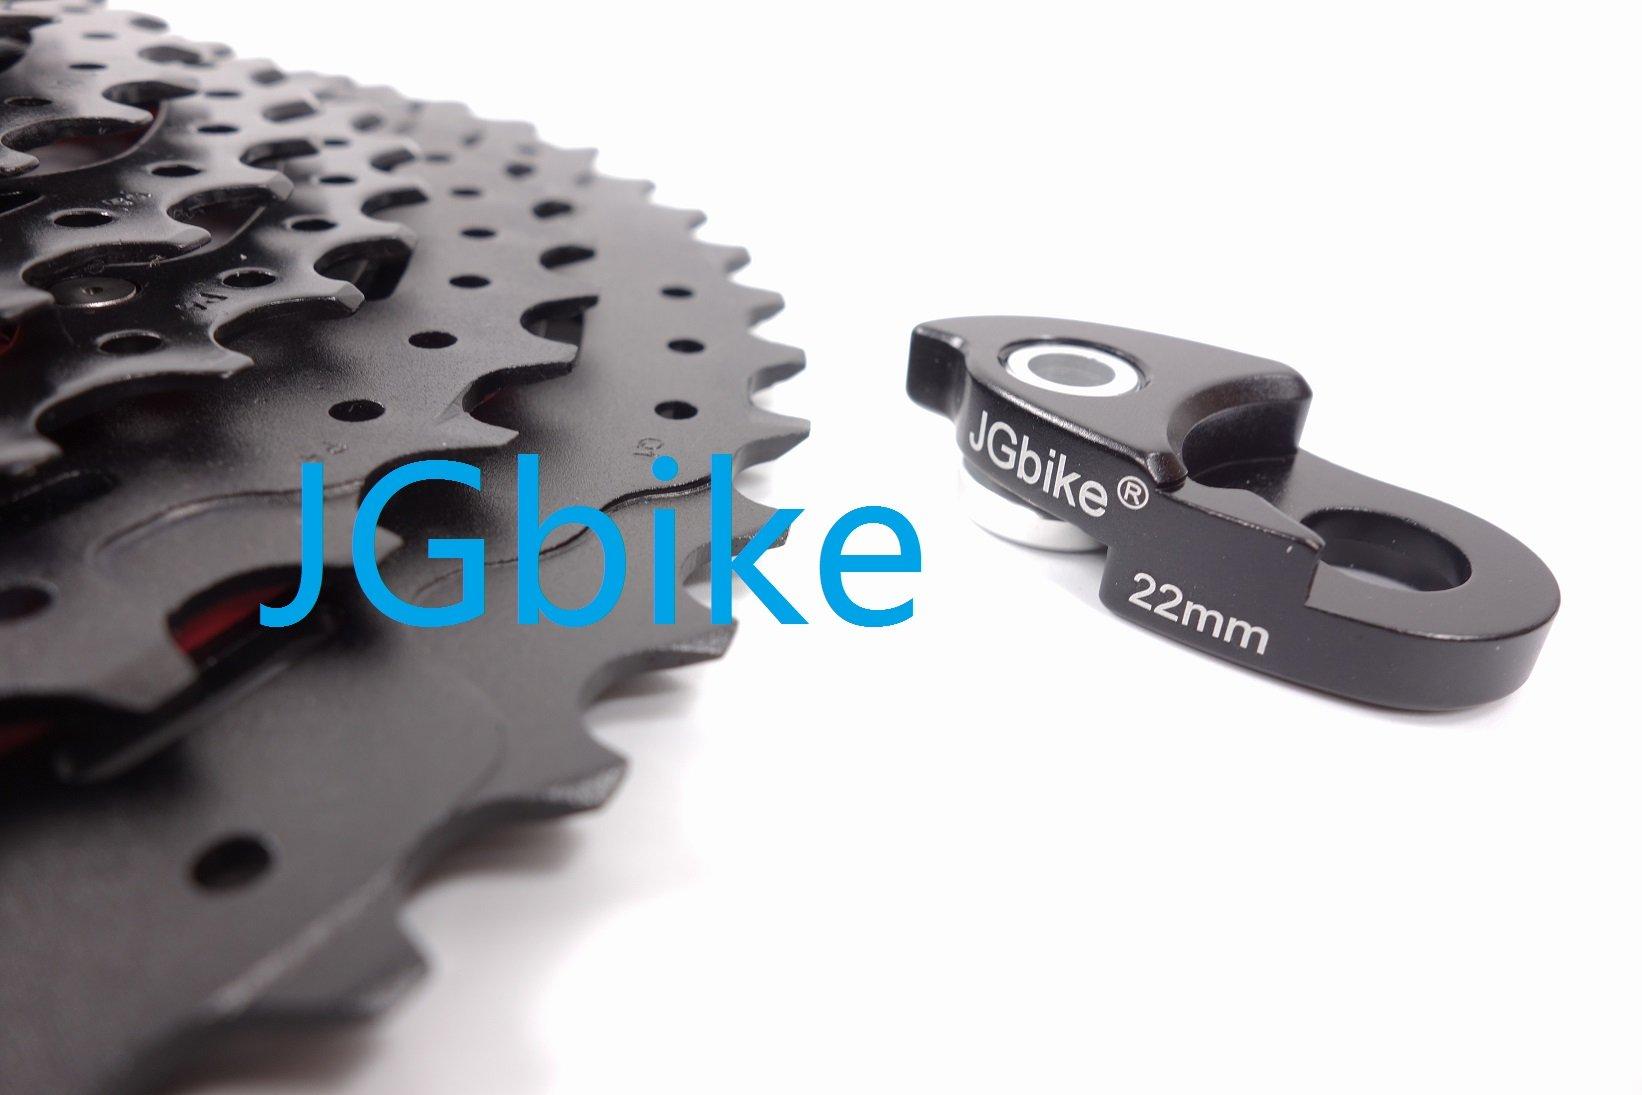 Sunrace 11-speed 11-50T CSMX80 wide ratio MTB Cassette freewheel with rear derailleur extender by JGbike (Black Chrome) by JGbike (Image #7)